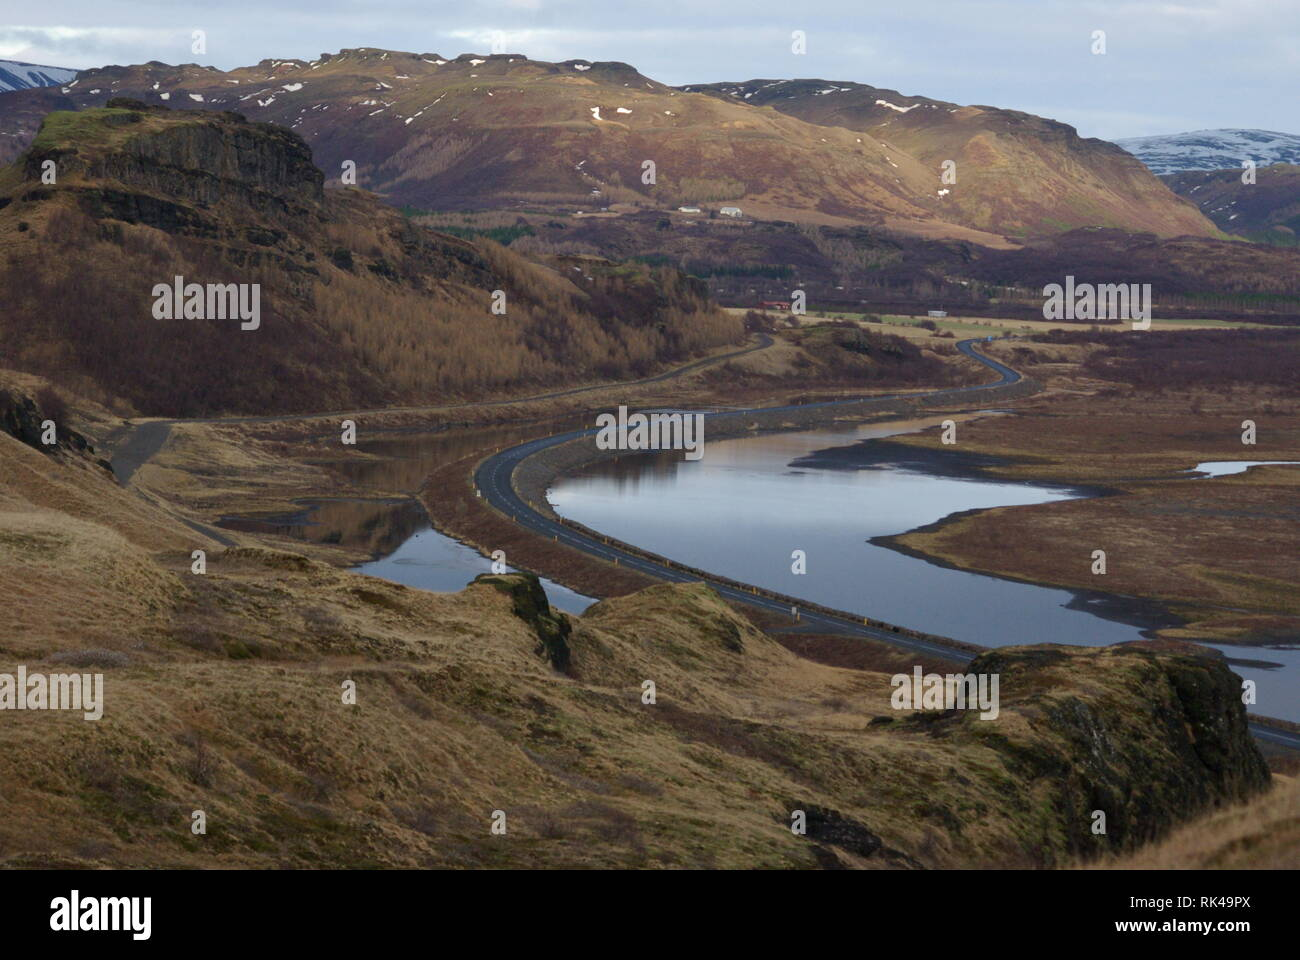 Islands Hochland - Stock Image